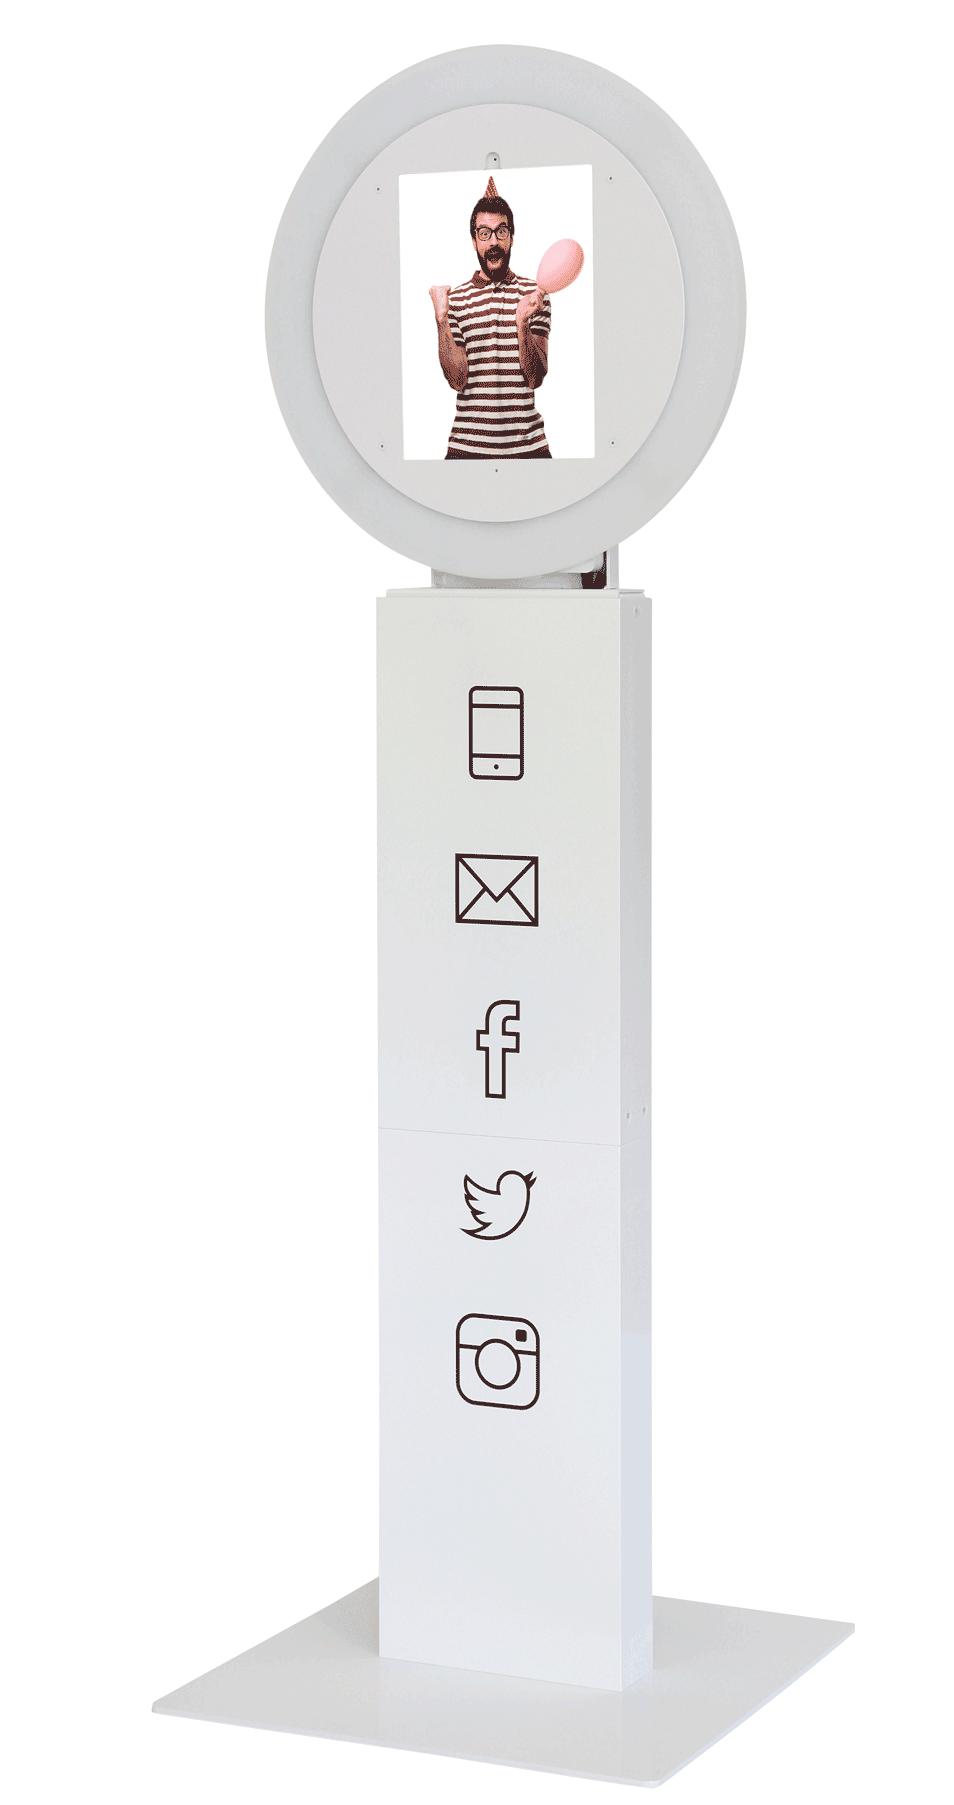 iLumini-Booth